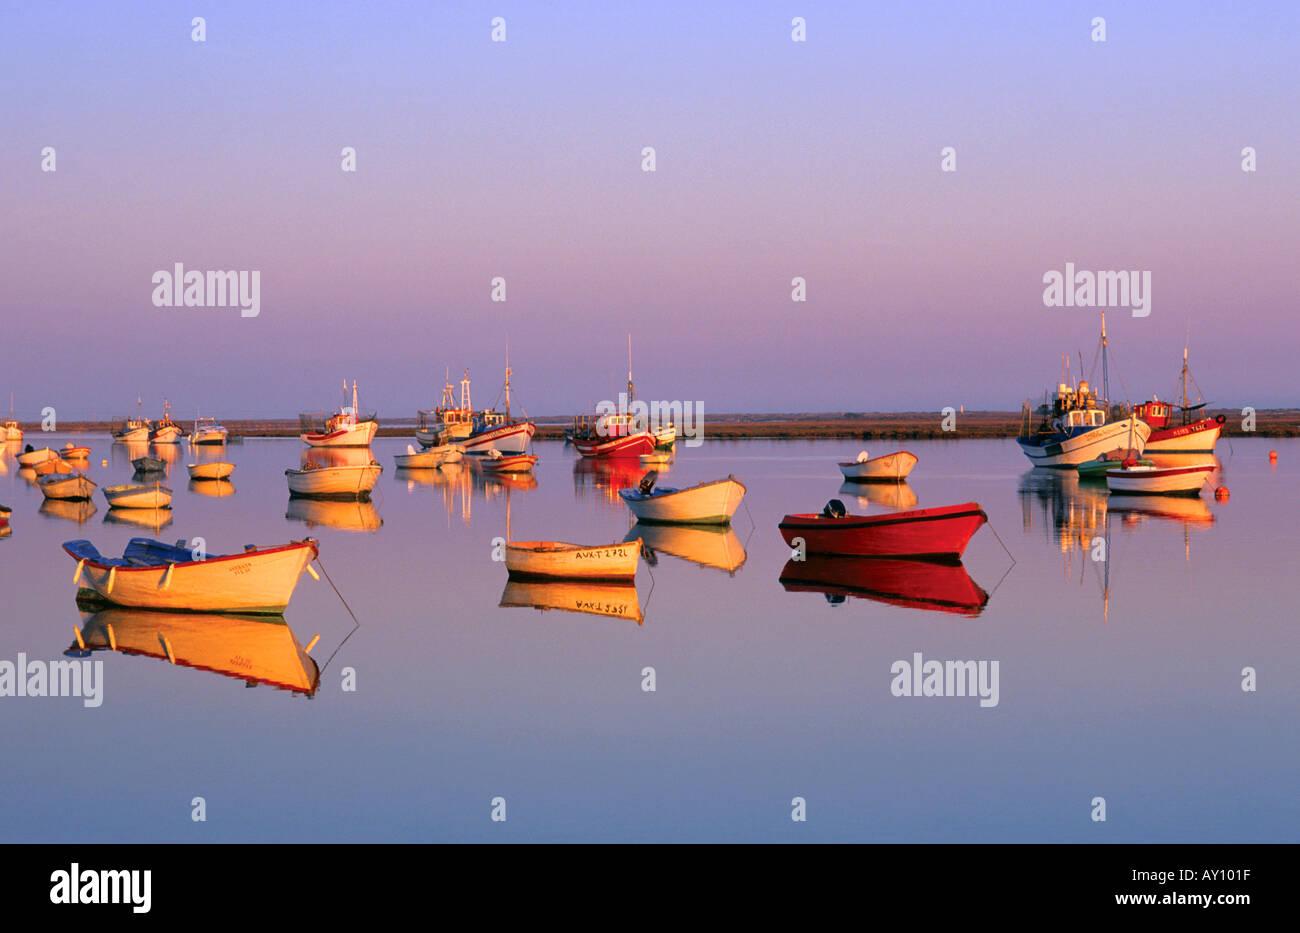 Boats on Ria formosa Santa Luzia Tavira Algarve Portugal Stock Photo